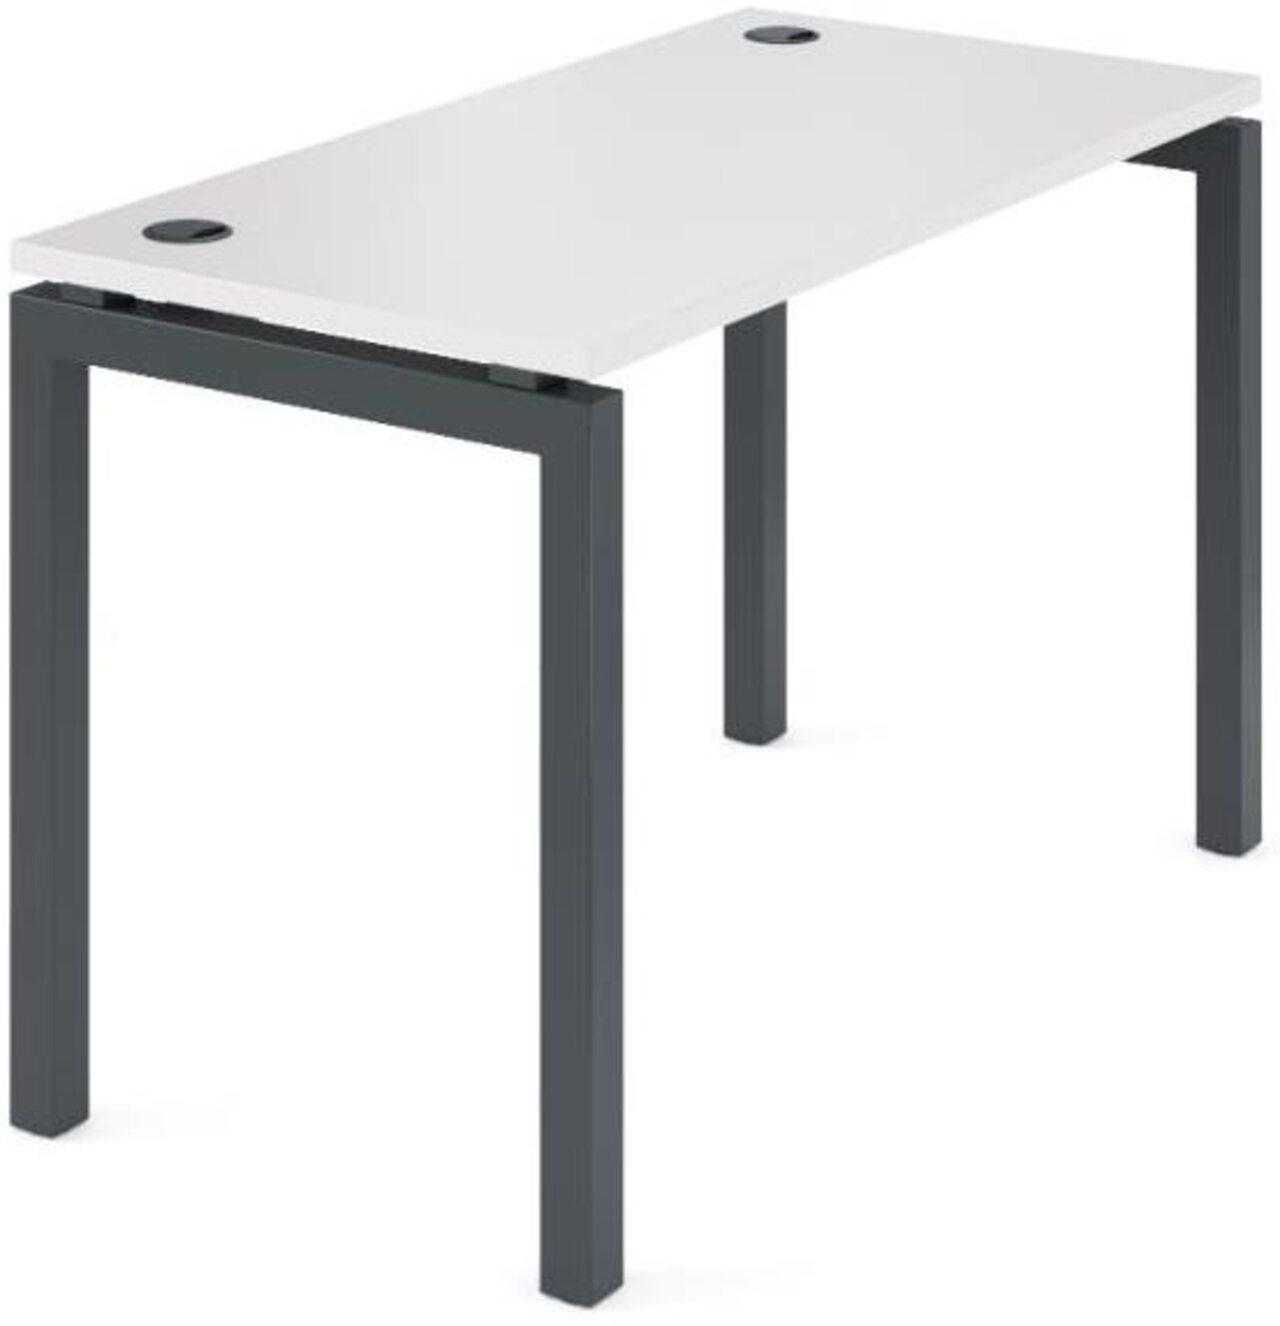 Стол на металлокаркасе  Арго 120x60x76 - фото 3